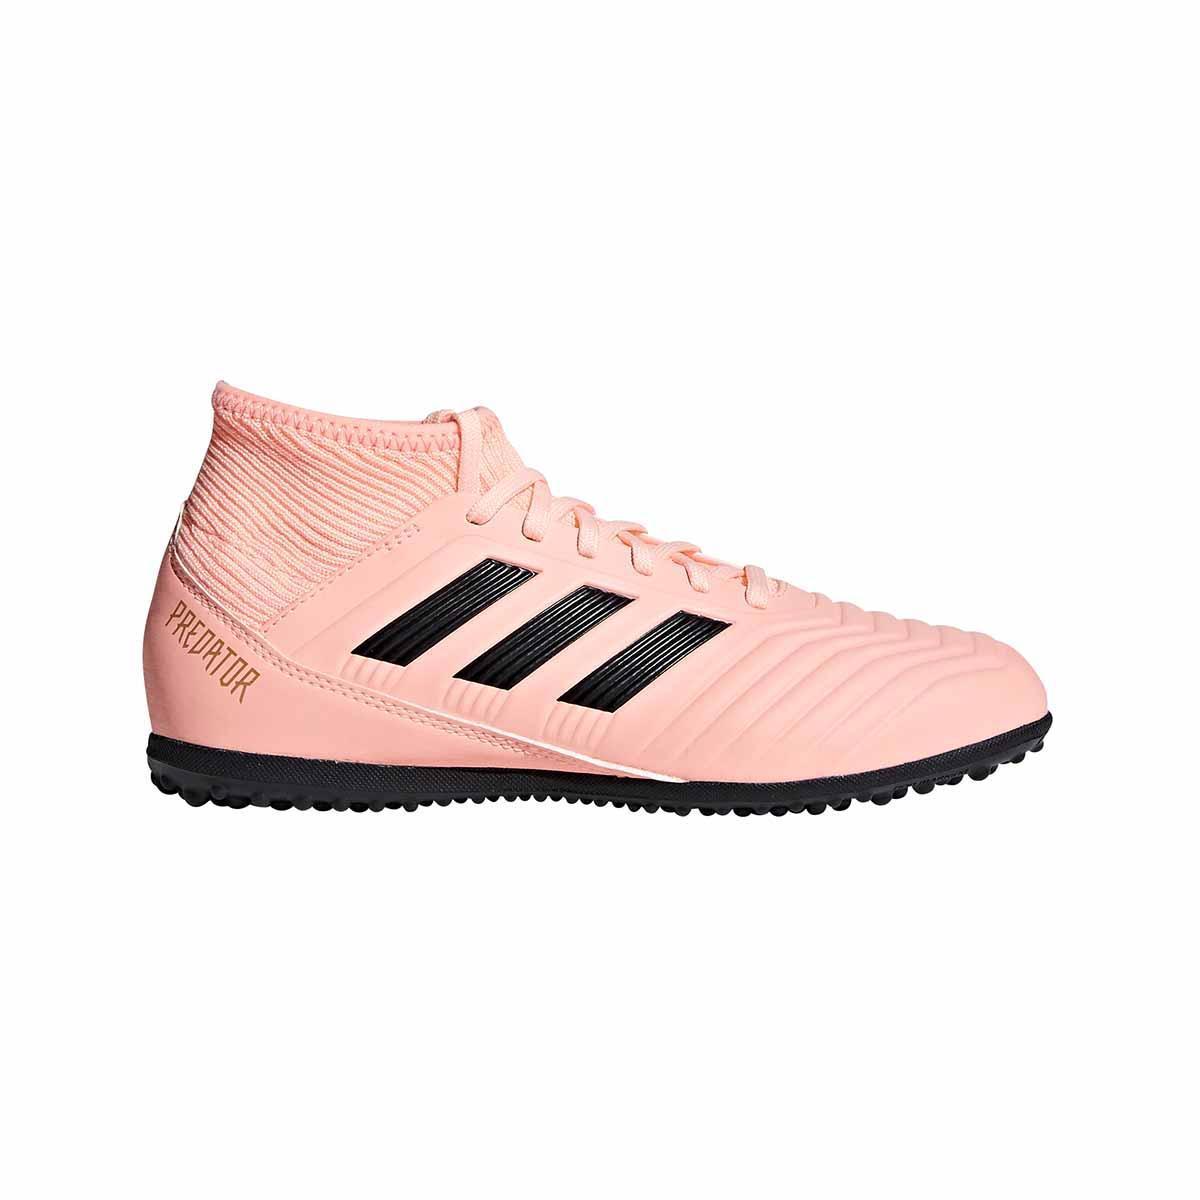 2f265e4d2 adidas Predator Tango 18.3 TF J - Clear Orange/Black/Trace Pink ...